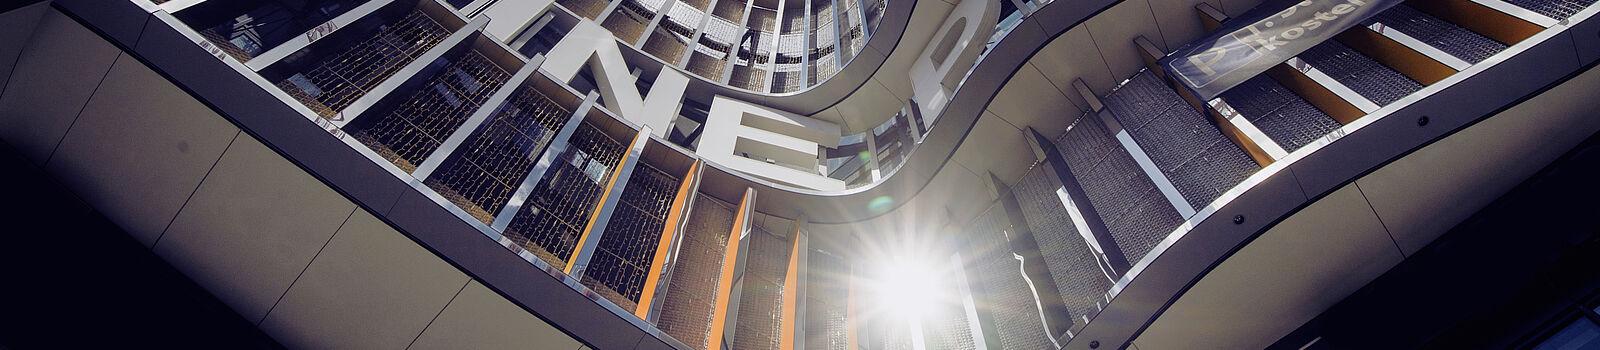 centerplan skyline plaza frankfurt. Black Bedroom Furniture Sets. Home Design Ideas